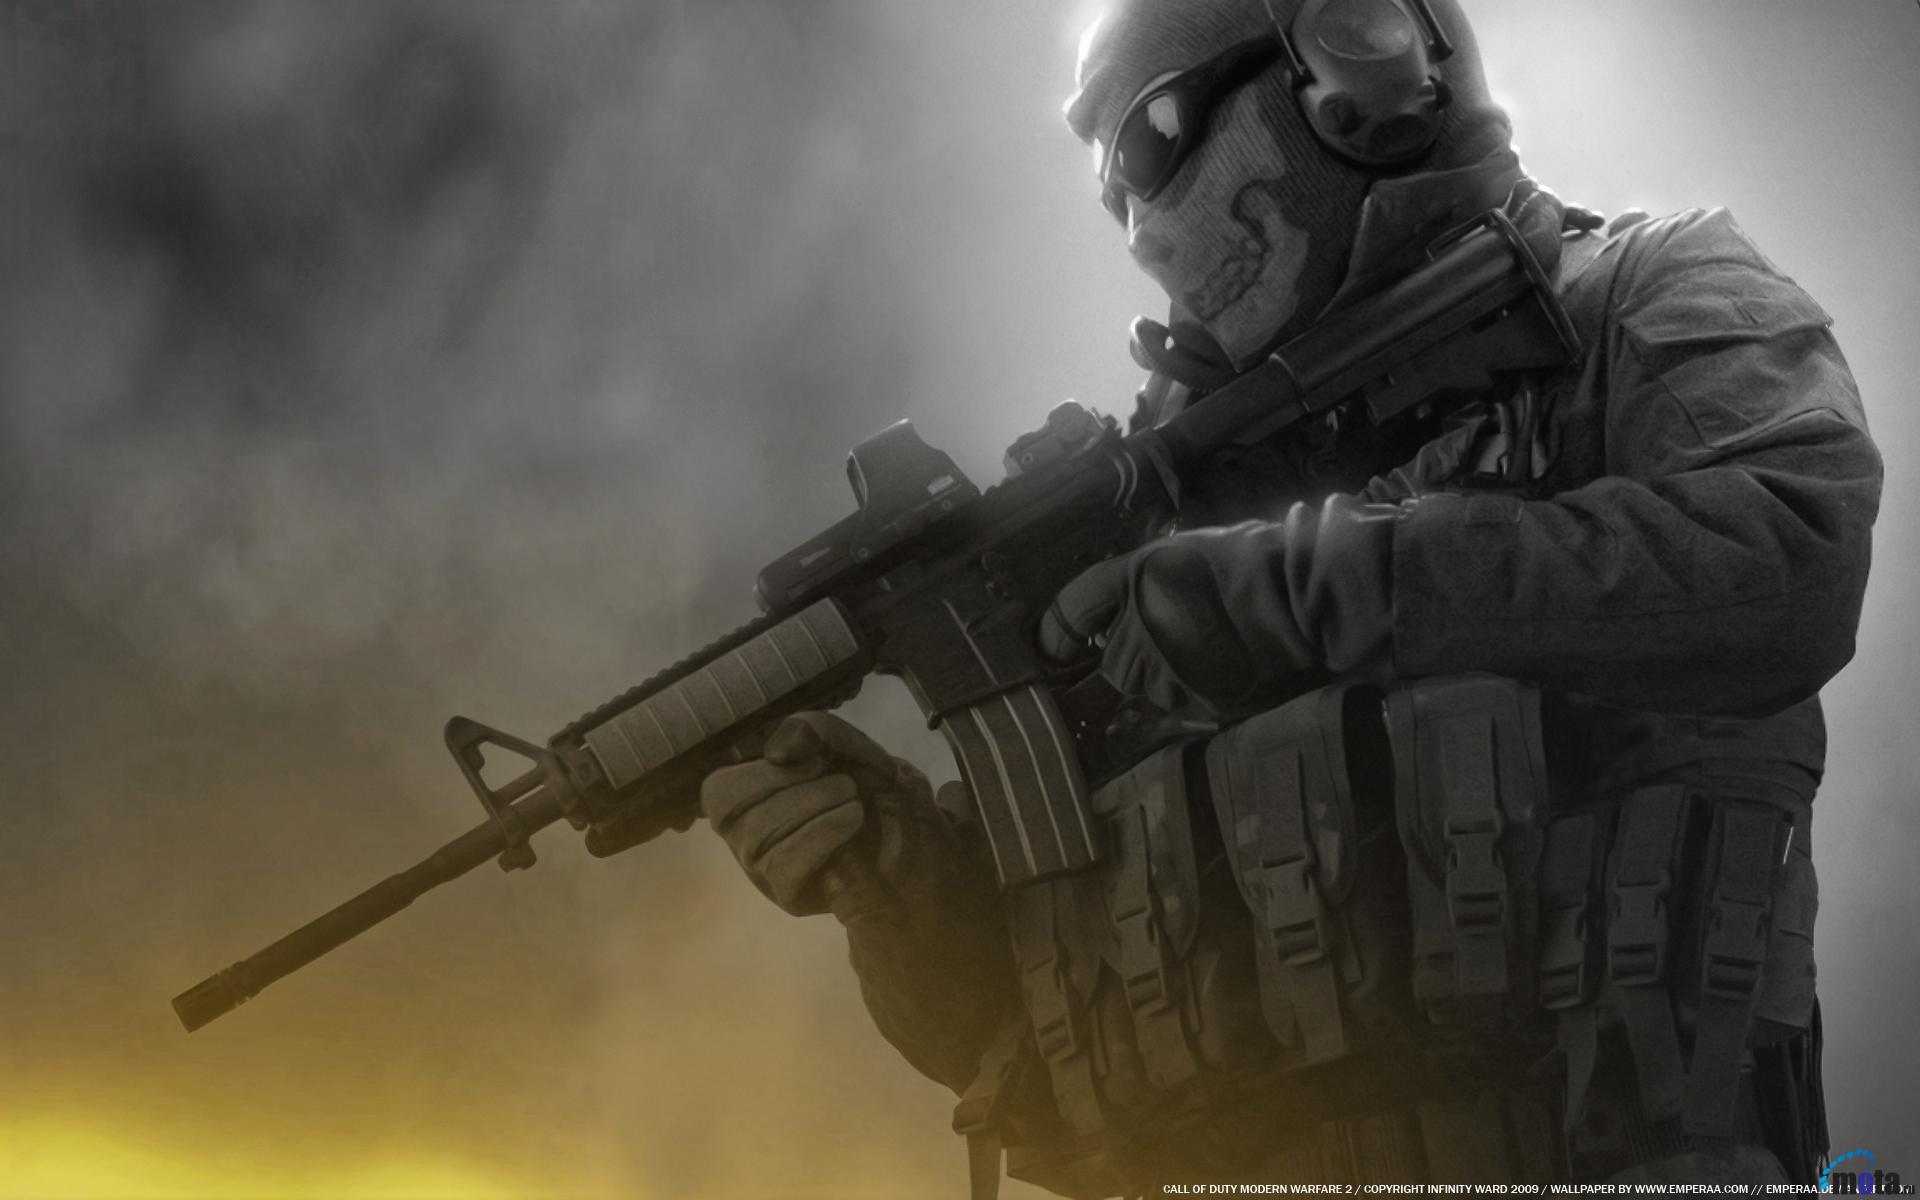 Warfare 2 Wallpaper Ghost 5942 Hd Wallpapers in Games   Imagescicom 1920x1200